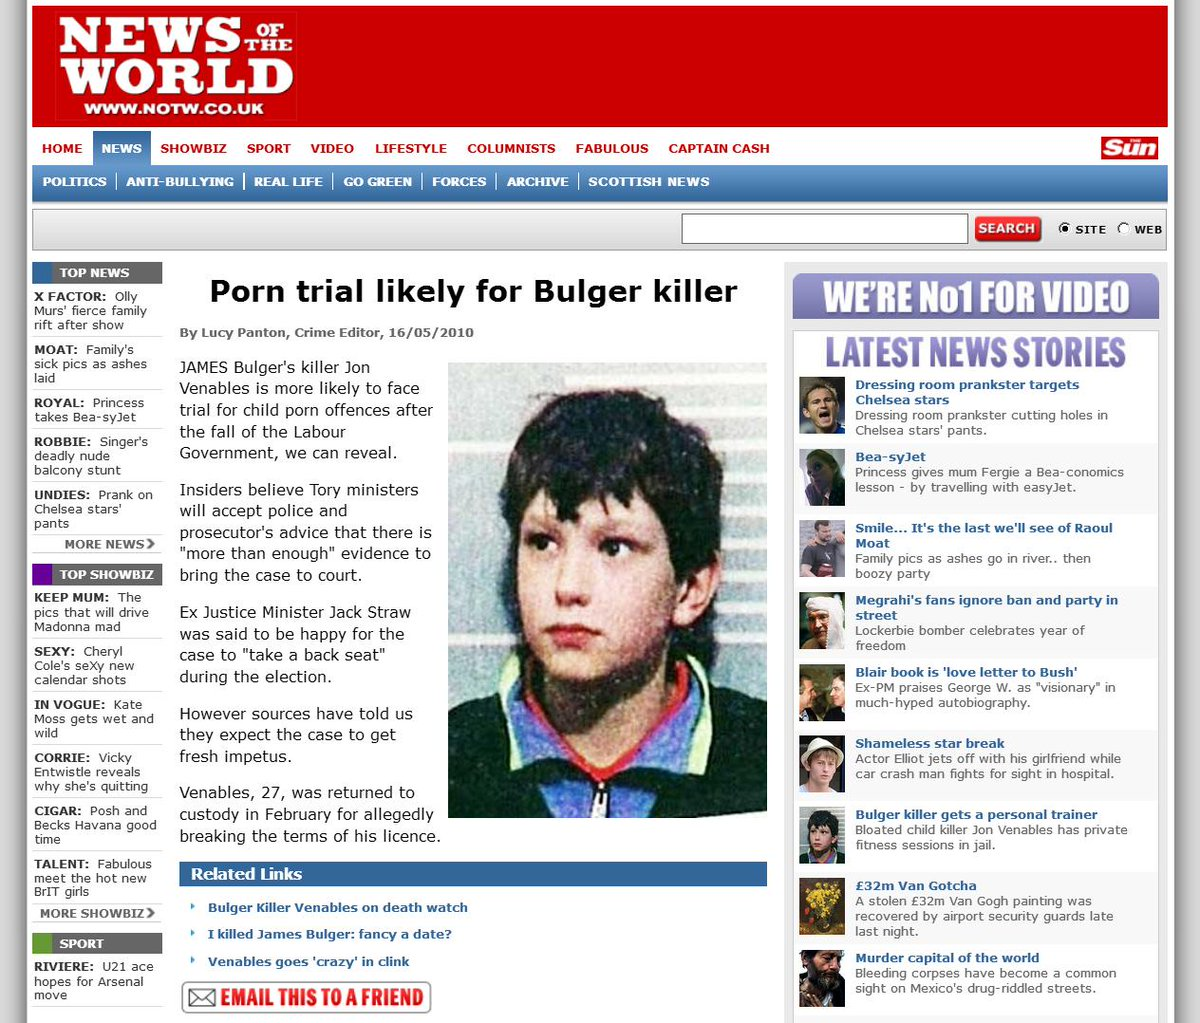 Jamie Bulger Killer auf Dating-Website